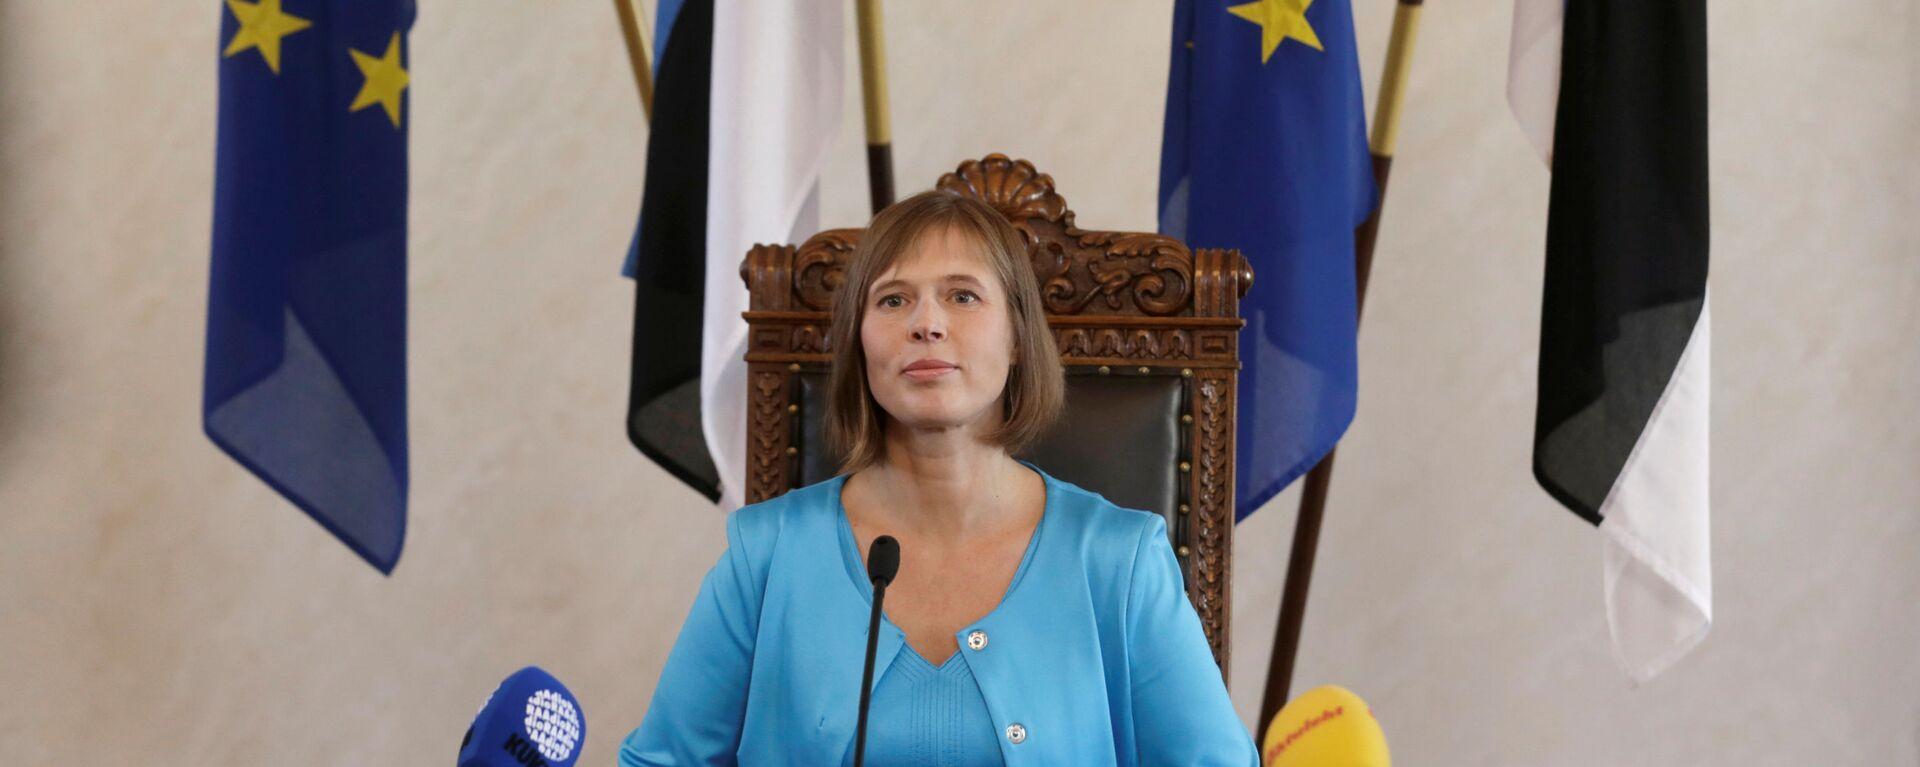 Prezydent Estonii Kersti Kaljulaid - Sputnik Polska, 1920, 29.08.2021